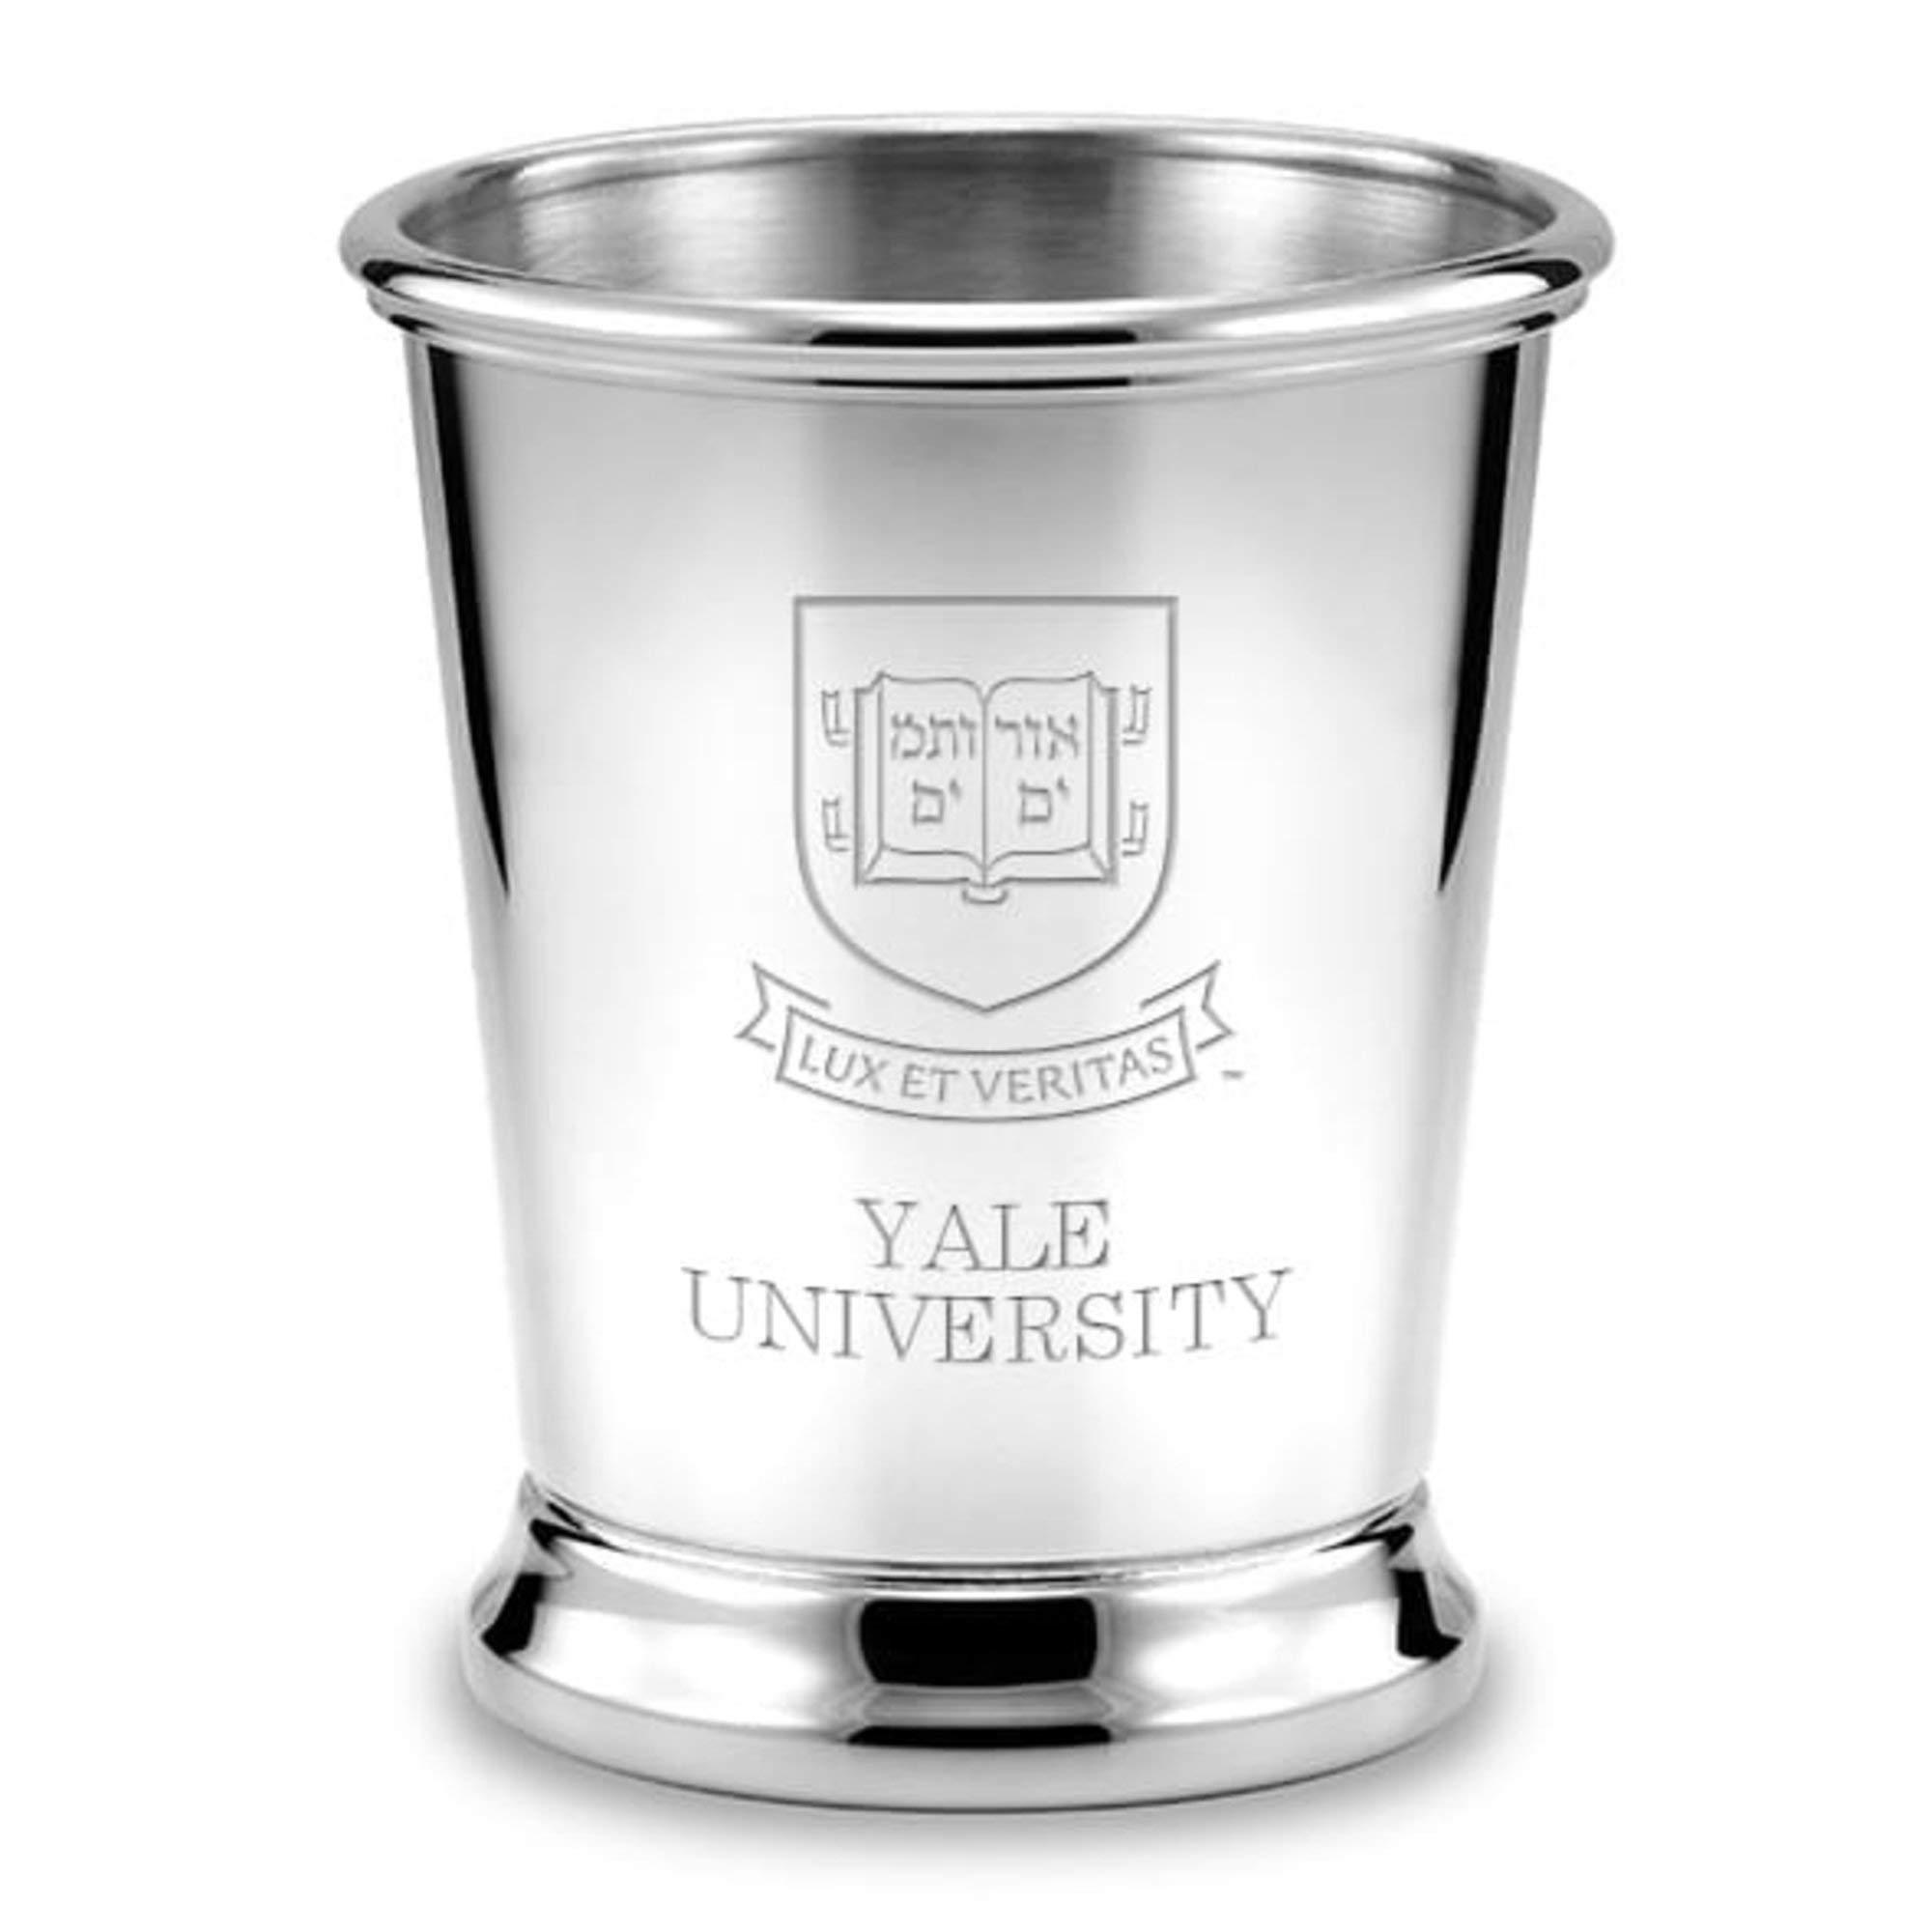 M. LA HART Yale Pewter Julep Cup